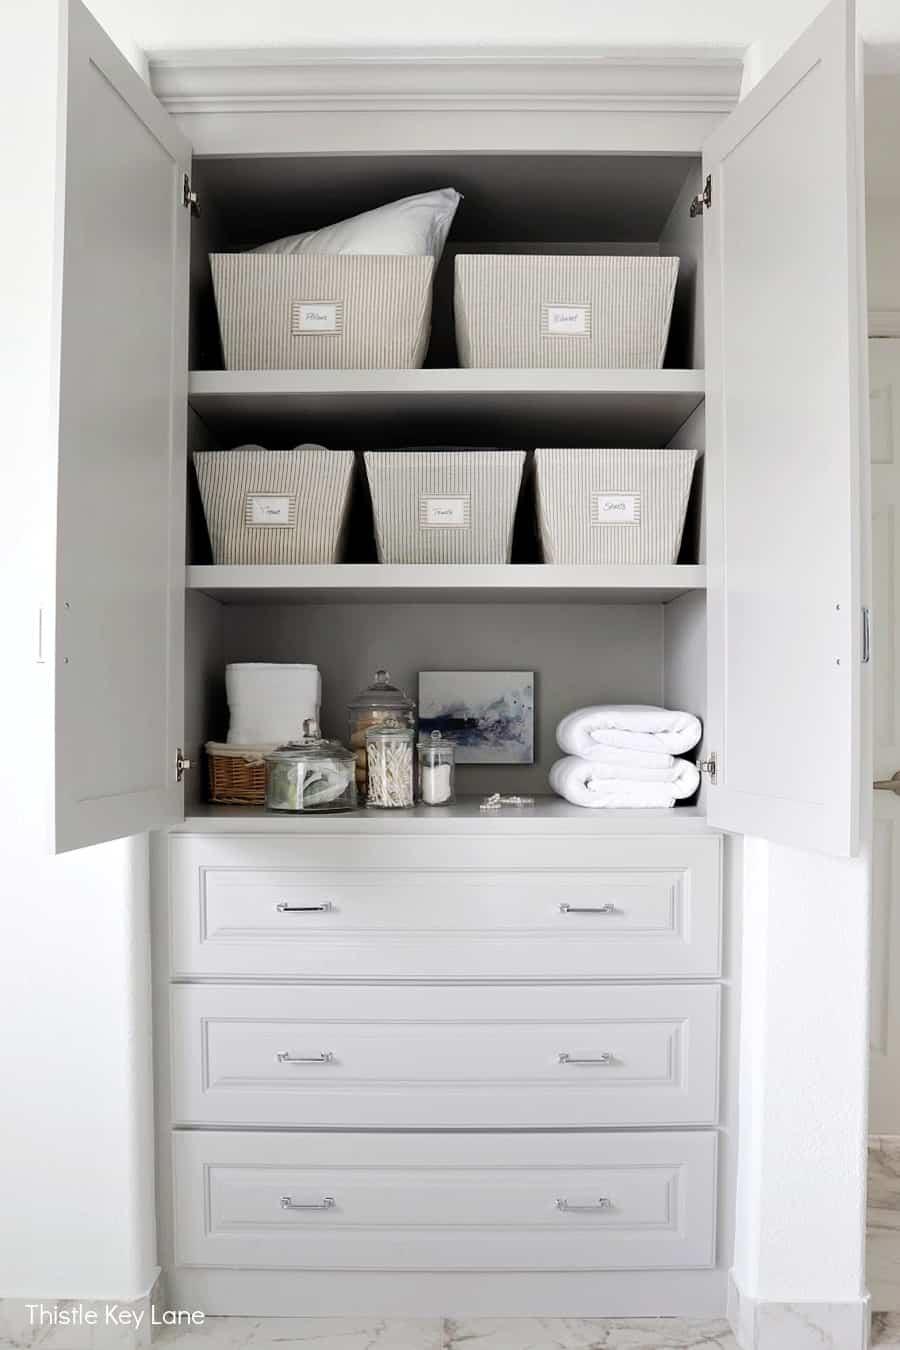 Storage shelves and drawers for bathroom. Organizing A Master Bathroom Linen Closet.